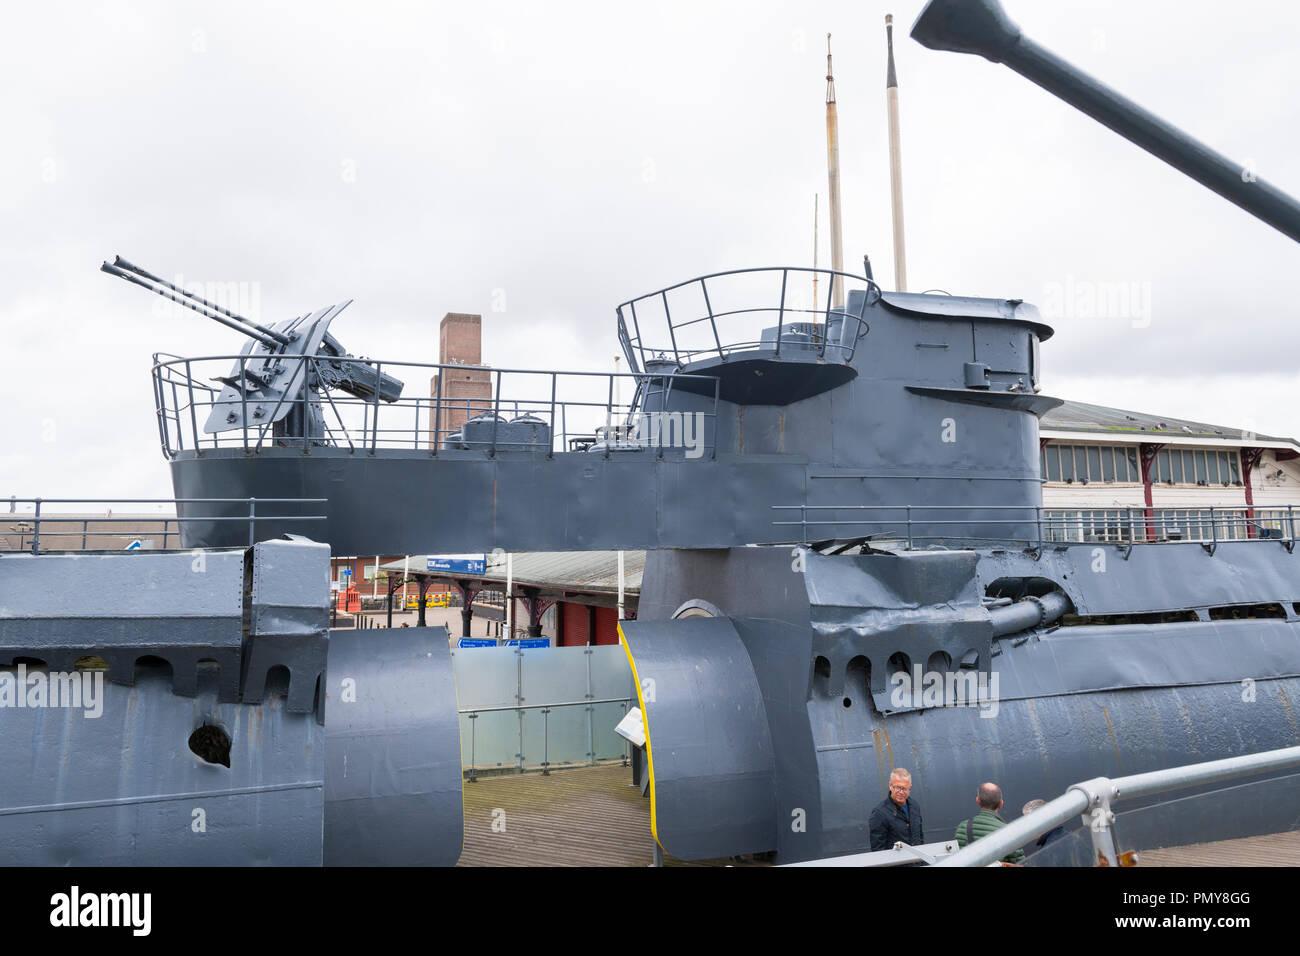 Liverpool Birkenhead Mersey Ferries Woodside Ferry Terminal Merseyside River Mersey u-boat  U-534 German submarine war ship sections to view interior - Stock Image